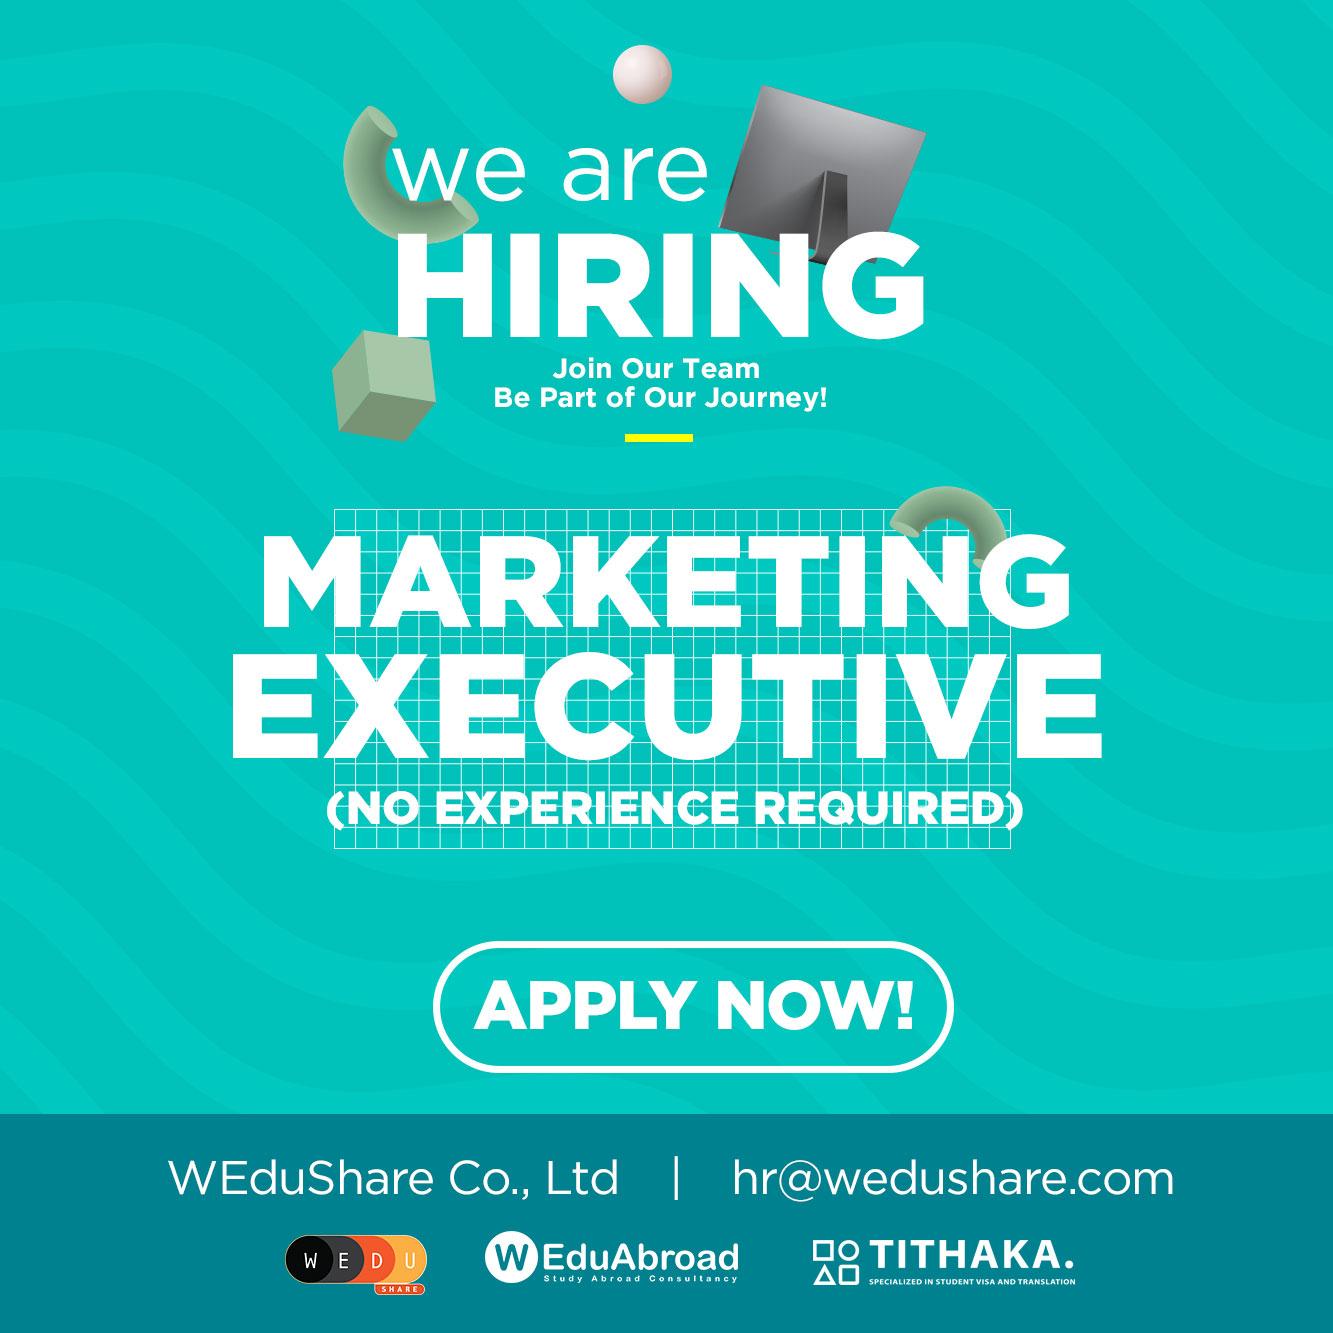 We are hiring Marketing Executive